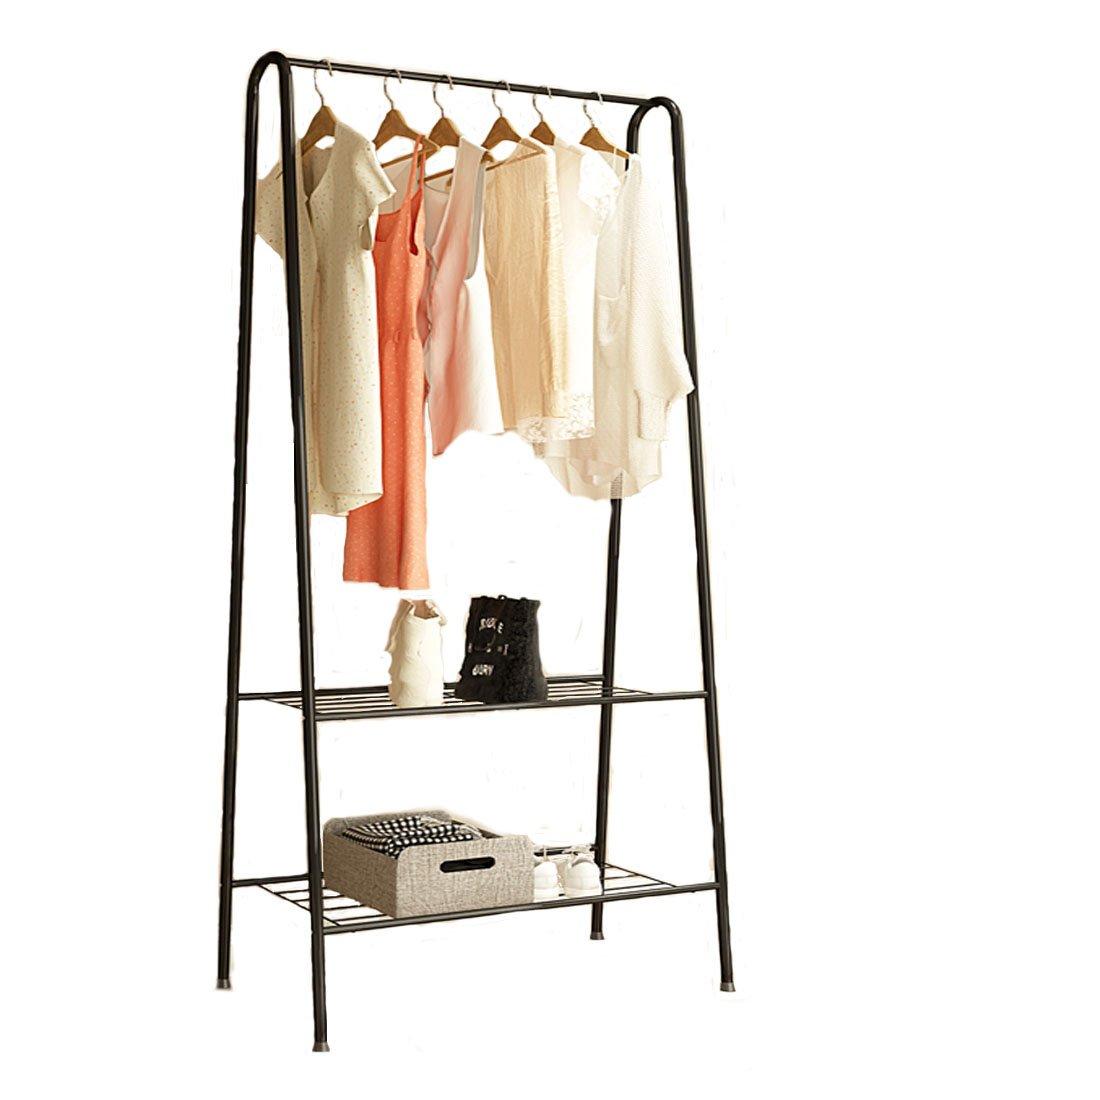 Fresh Household Garment Rack, Heavy Duty Coat Rack 2-Tier Metal Hanging Clothes Rack Portable Closet Bottom Shelves Shoes Storage - Black